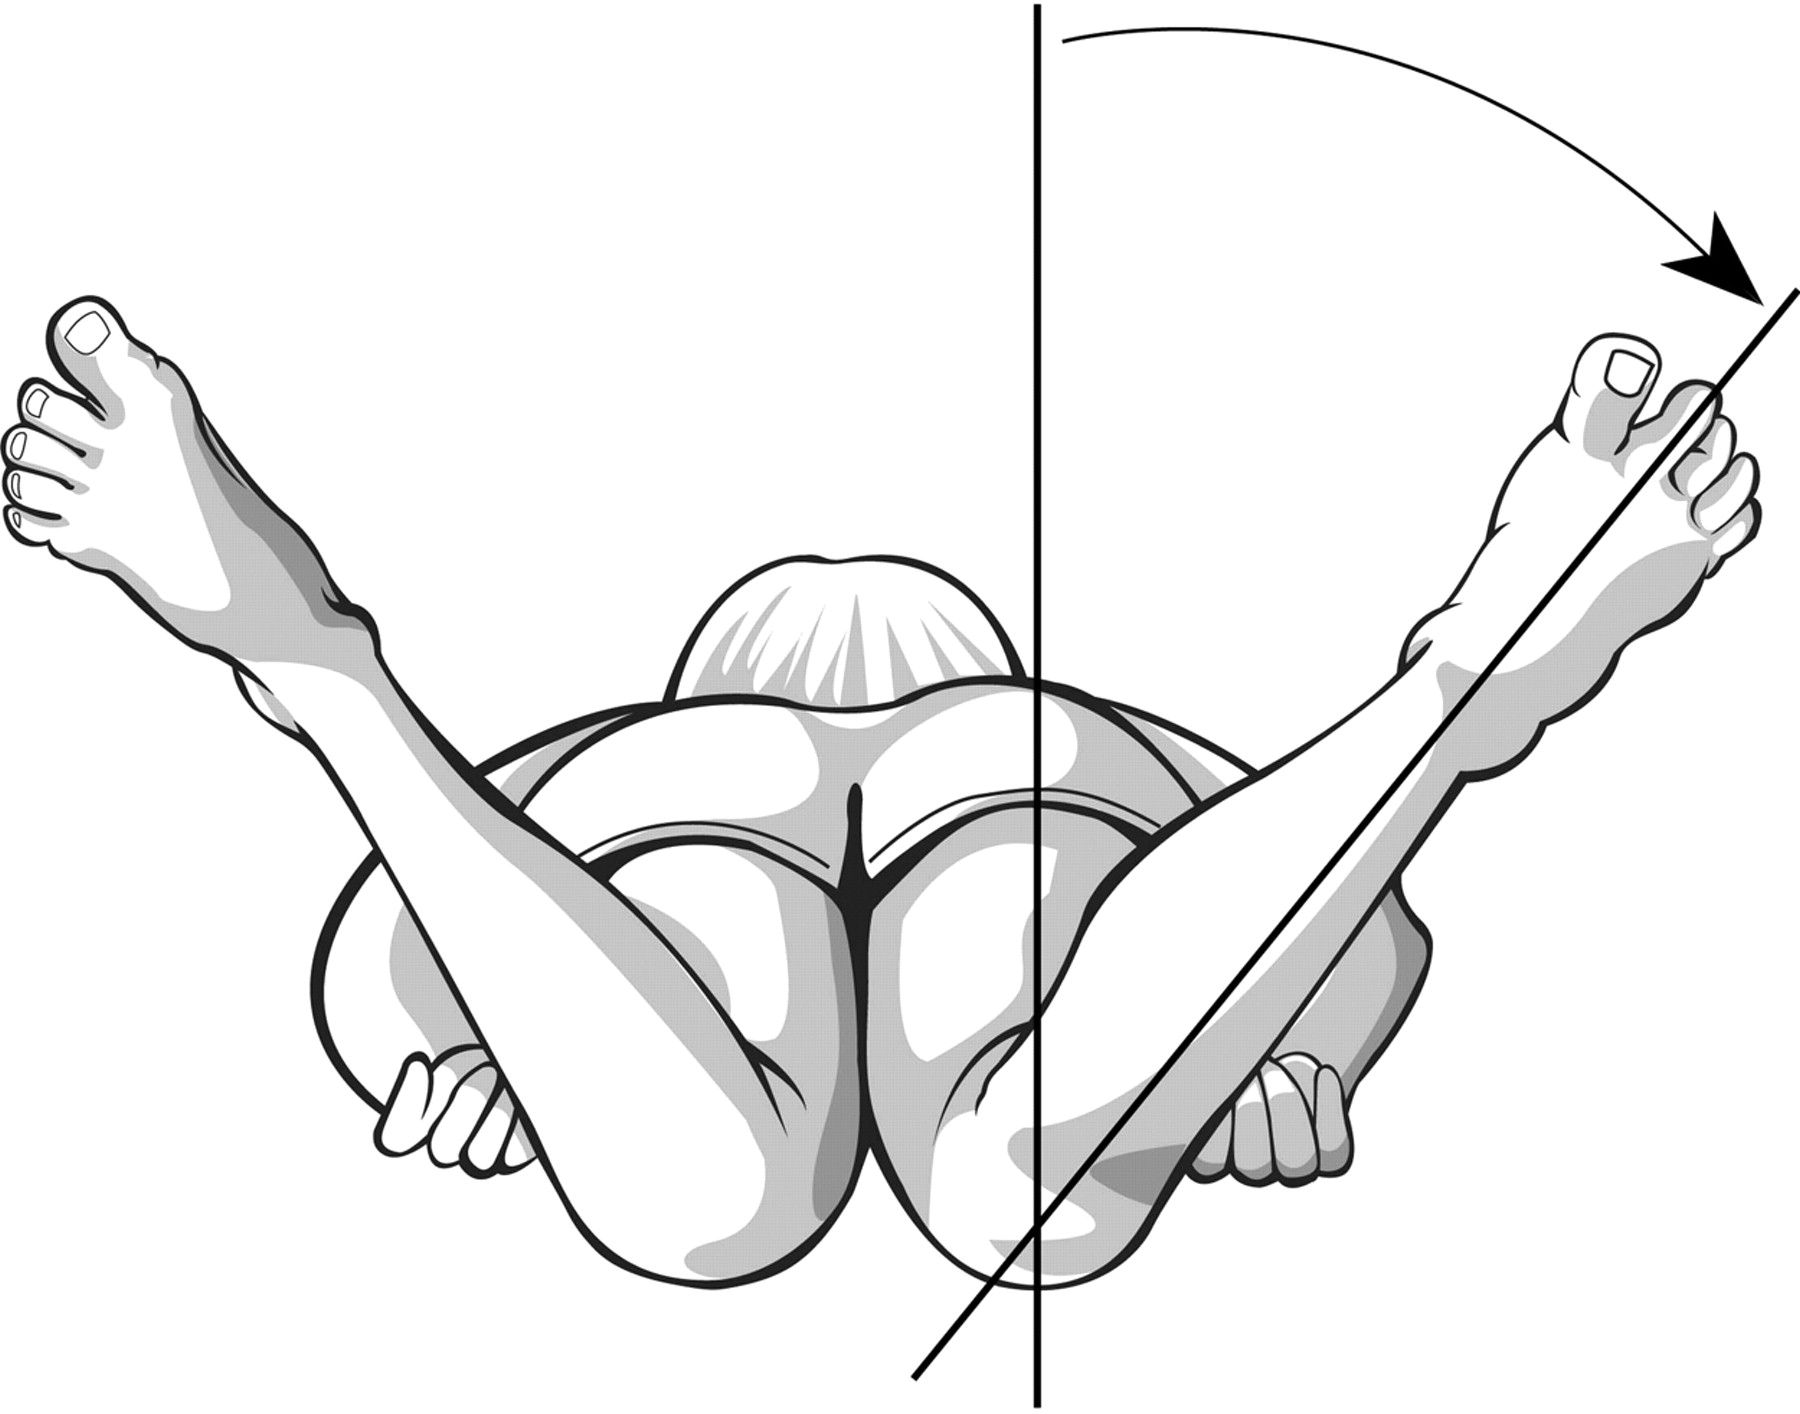 Hip Internal Rotation_Horeczko Tim